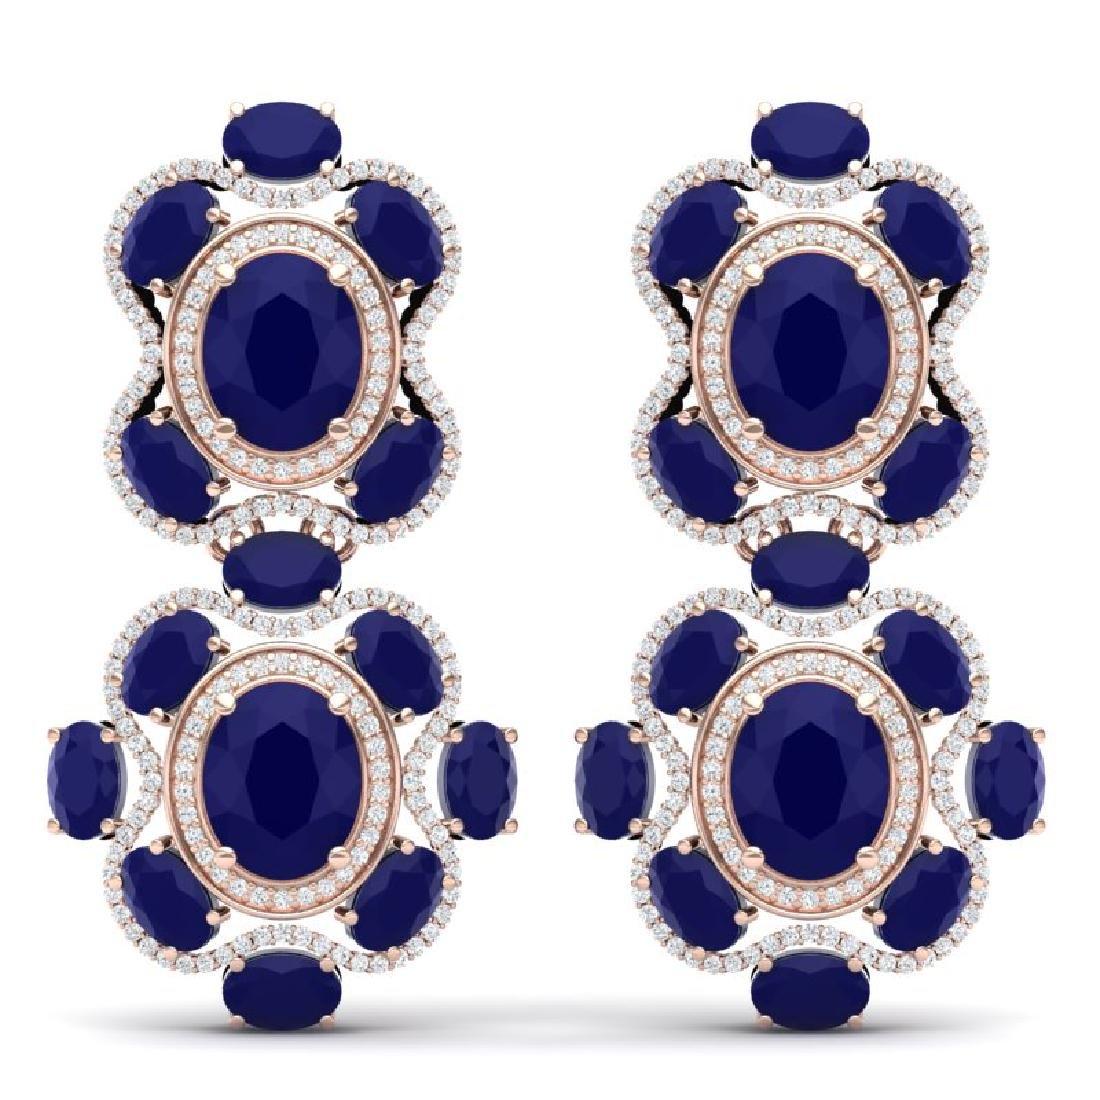 33.5 CTW Royalty Sapphire & VS Diamond Earrings 18K